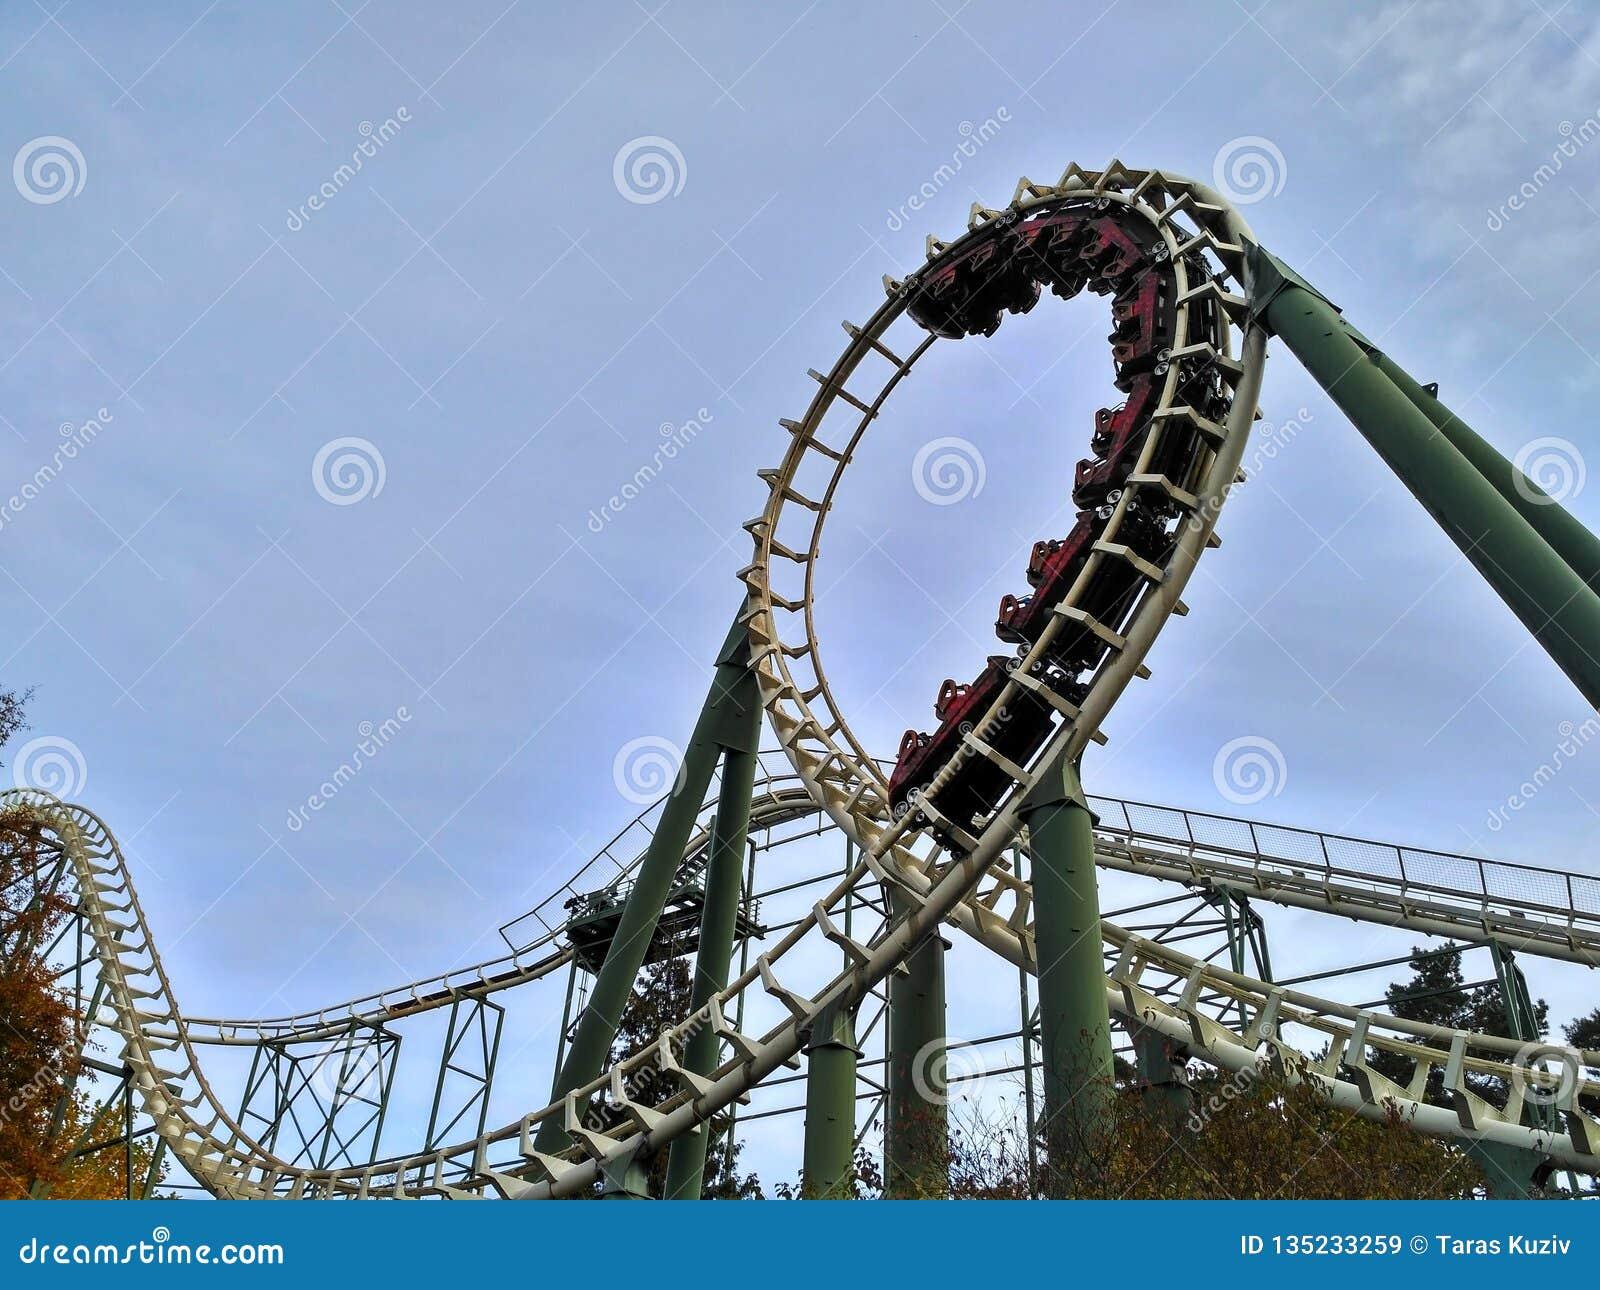 Kaatsheuvel / The Netherlands - November 03 2016: Speed roller coaster Python in action in Theme Park Efteling